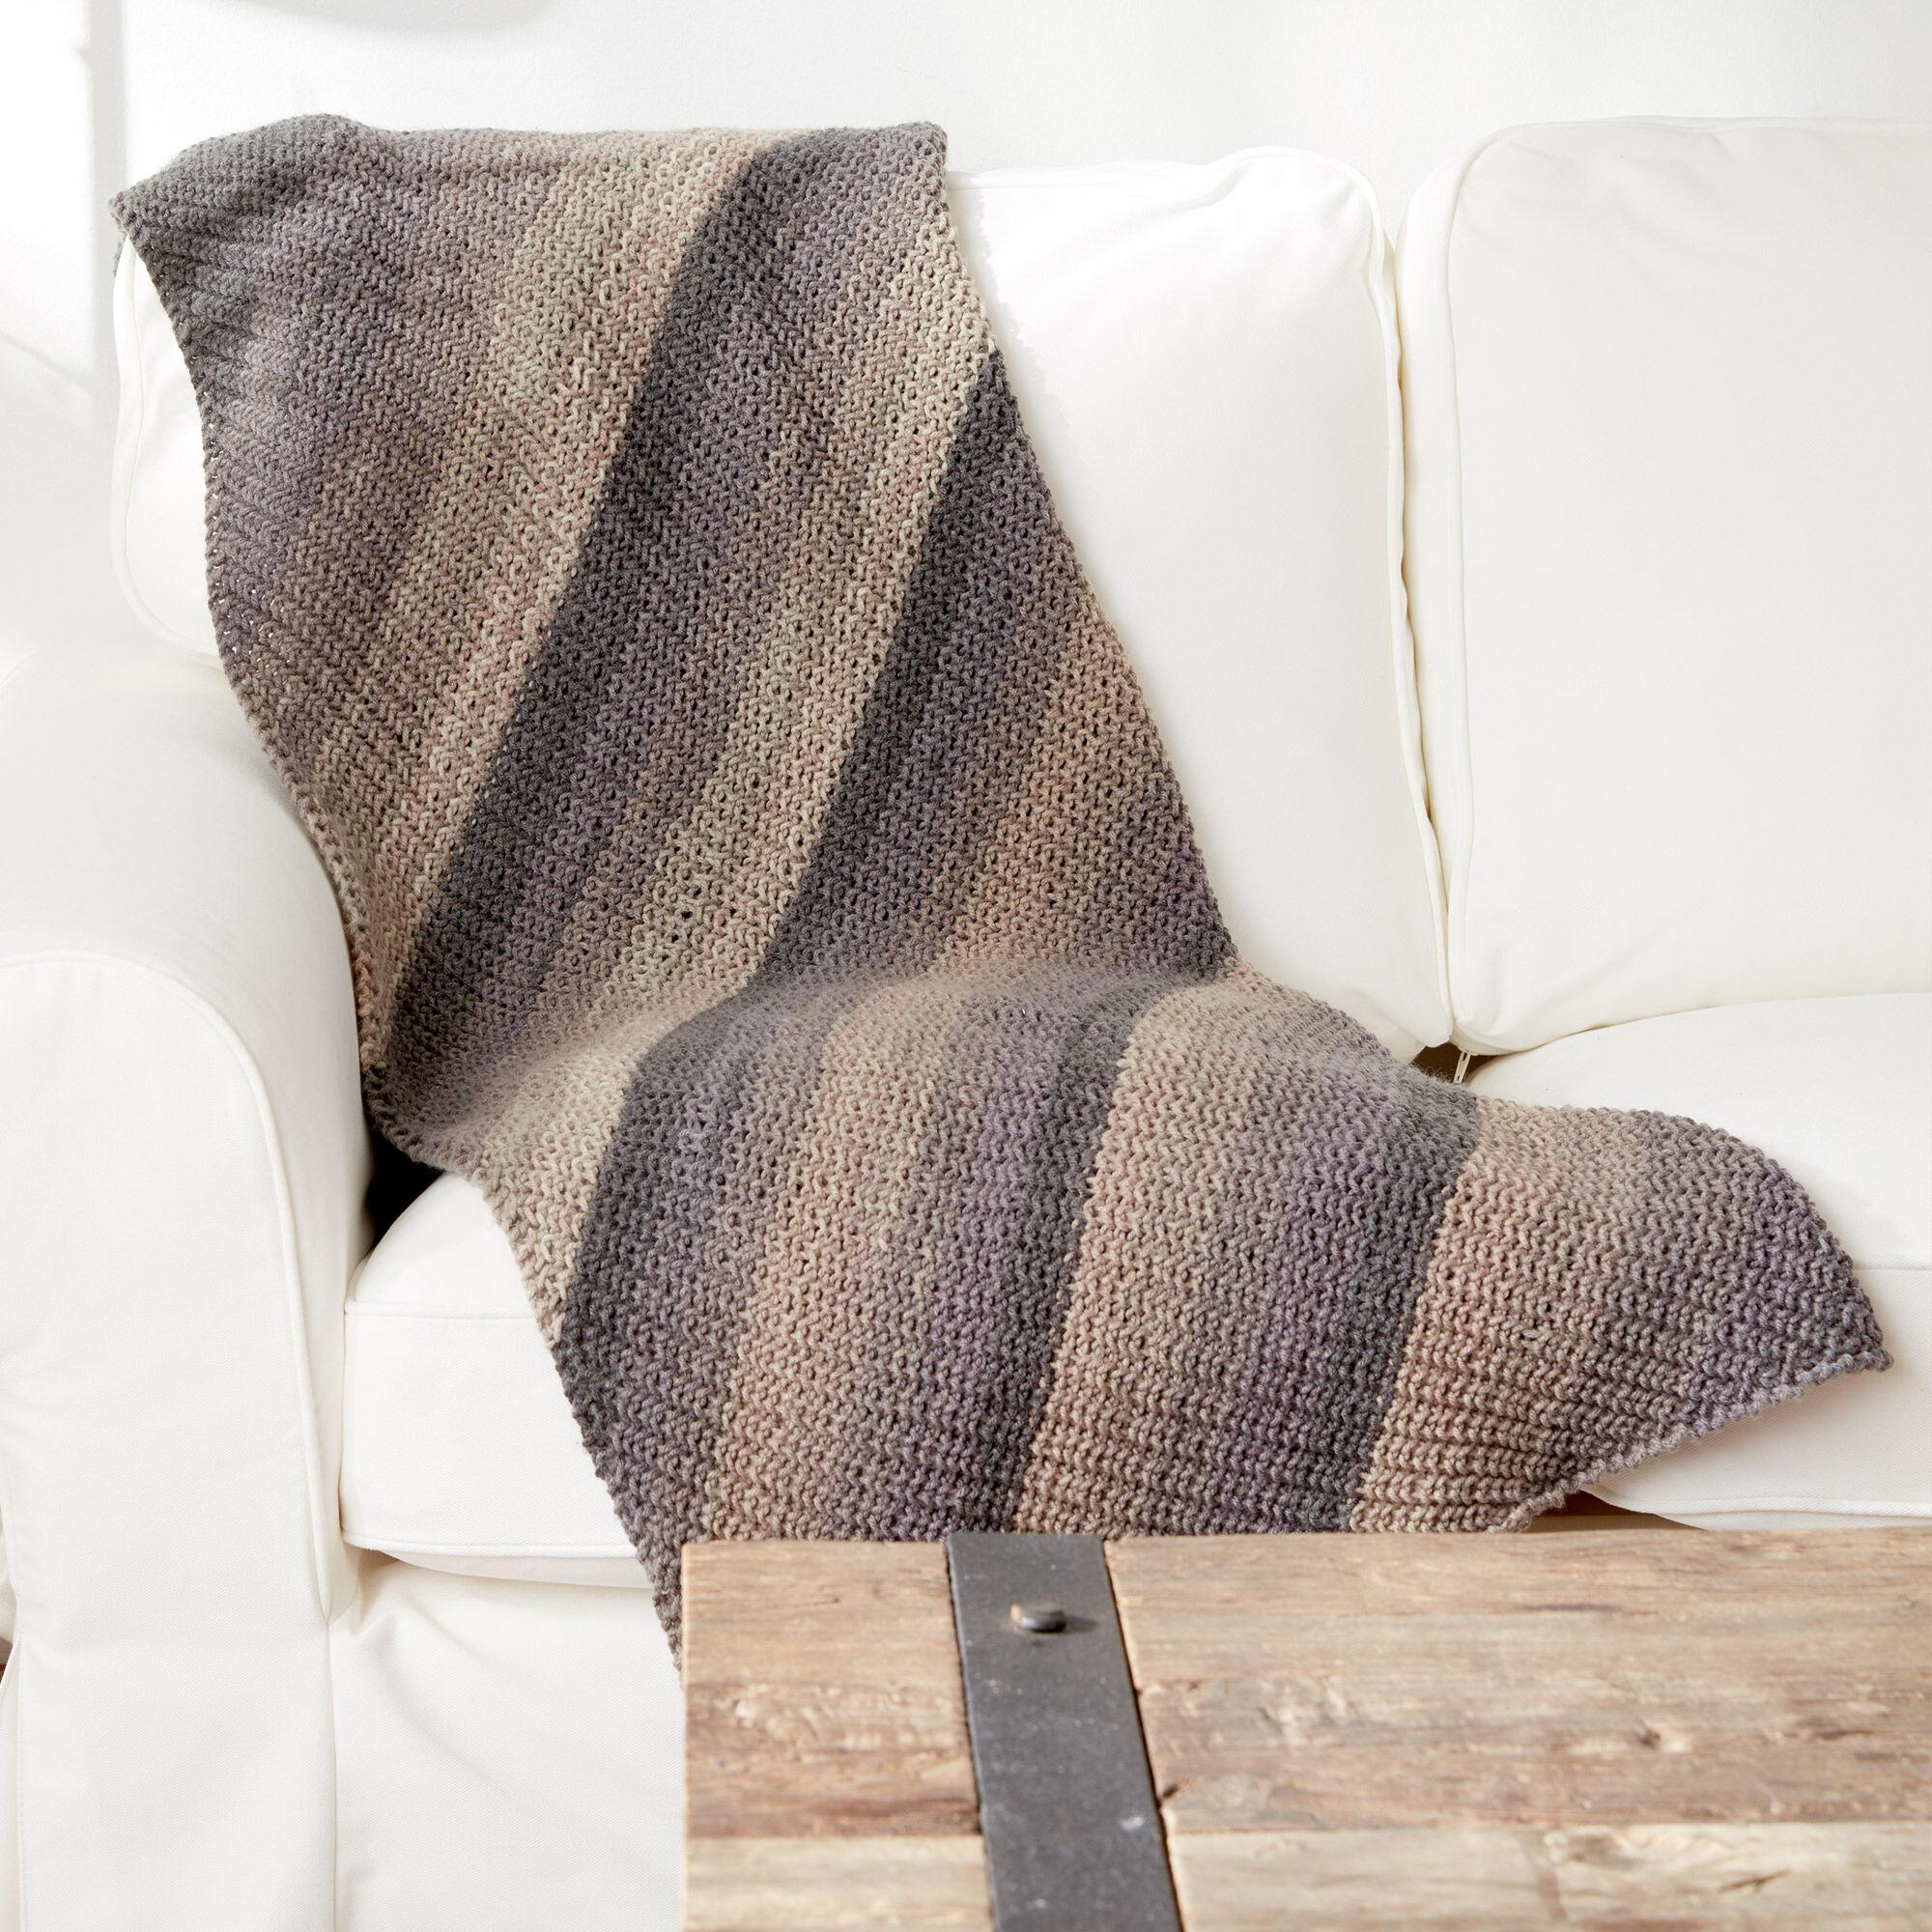 Caron Shake It Up Knit Blanket Pattern | Yarnspirations